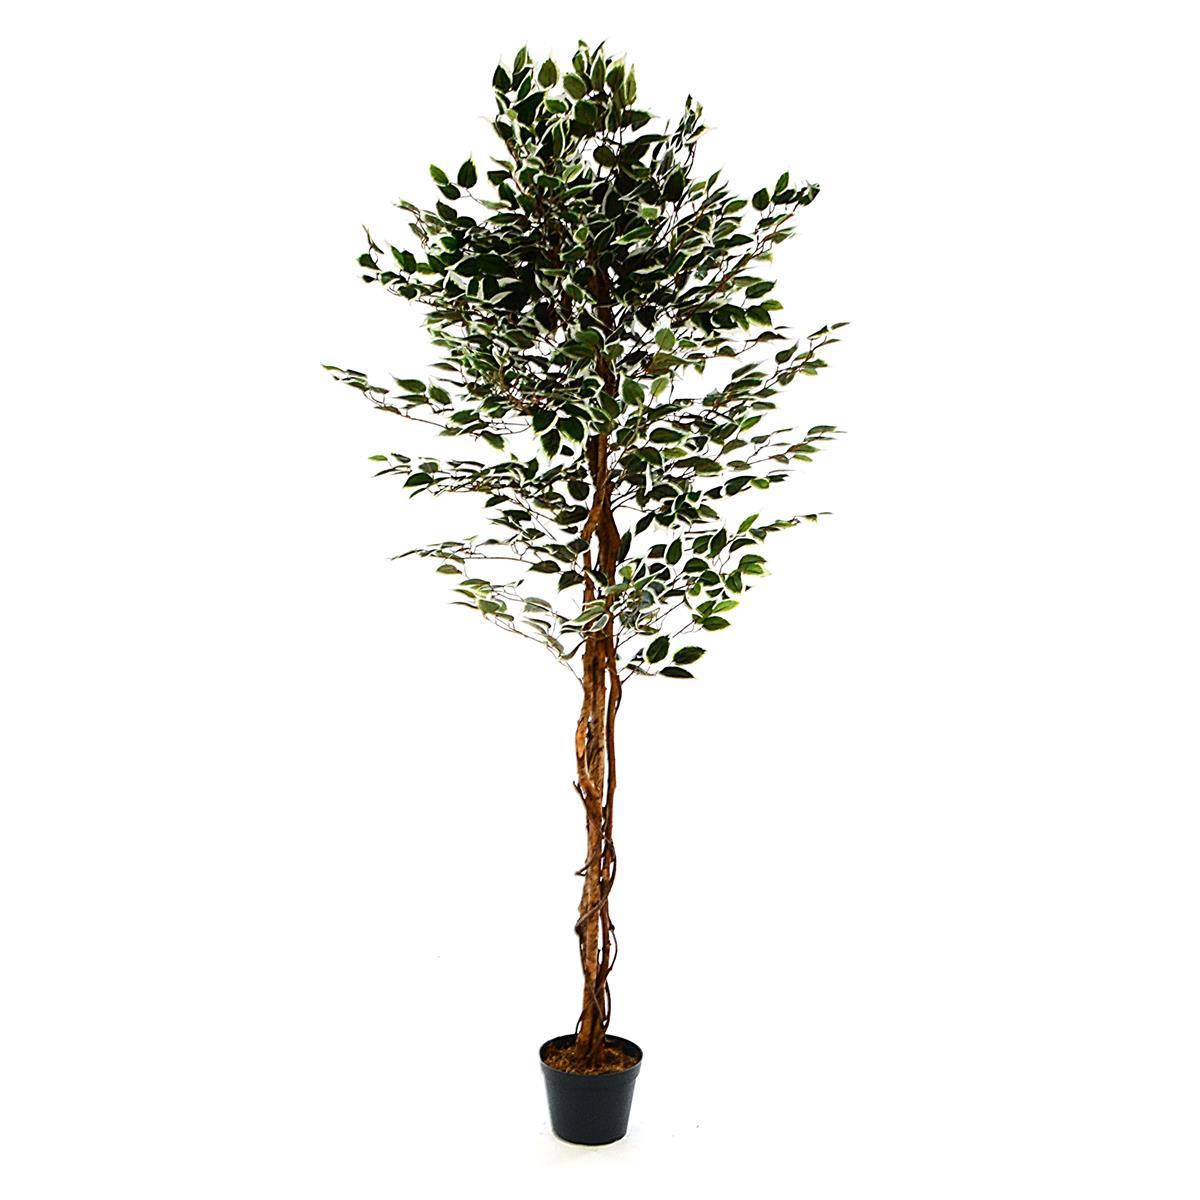 Ficus Benjamin Kunstpflanze Kunstbaum mit Echtholz-Stamm H 185 cm grün-weiß